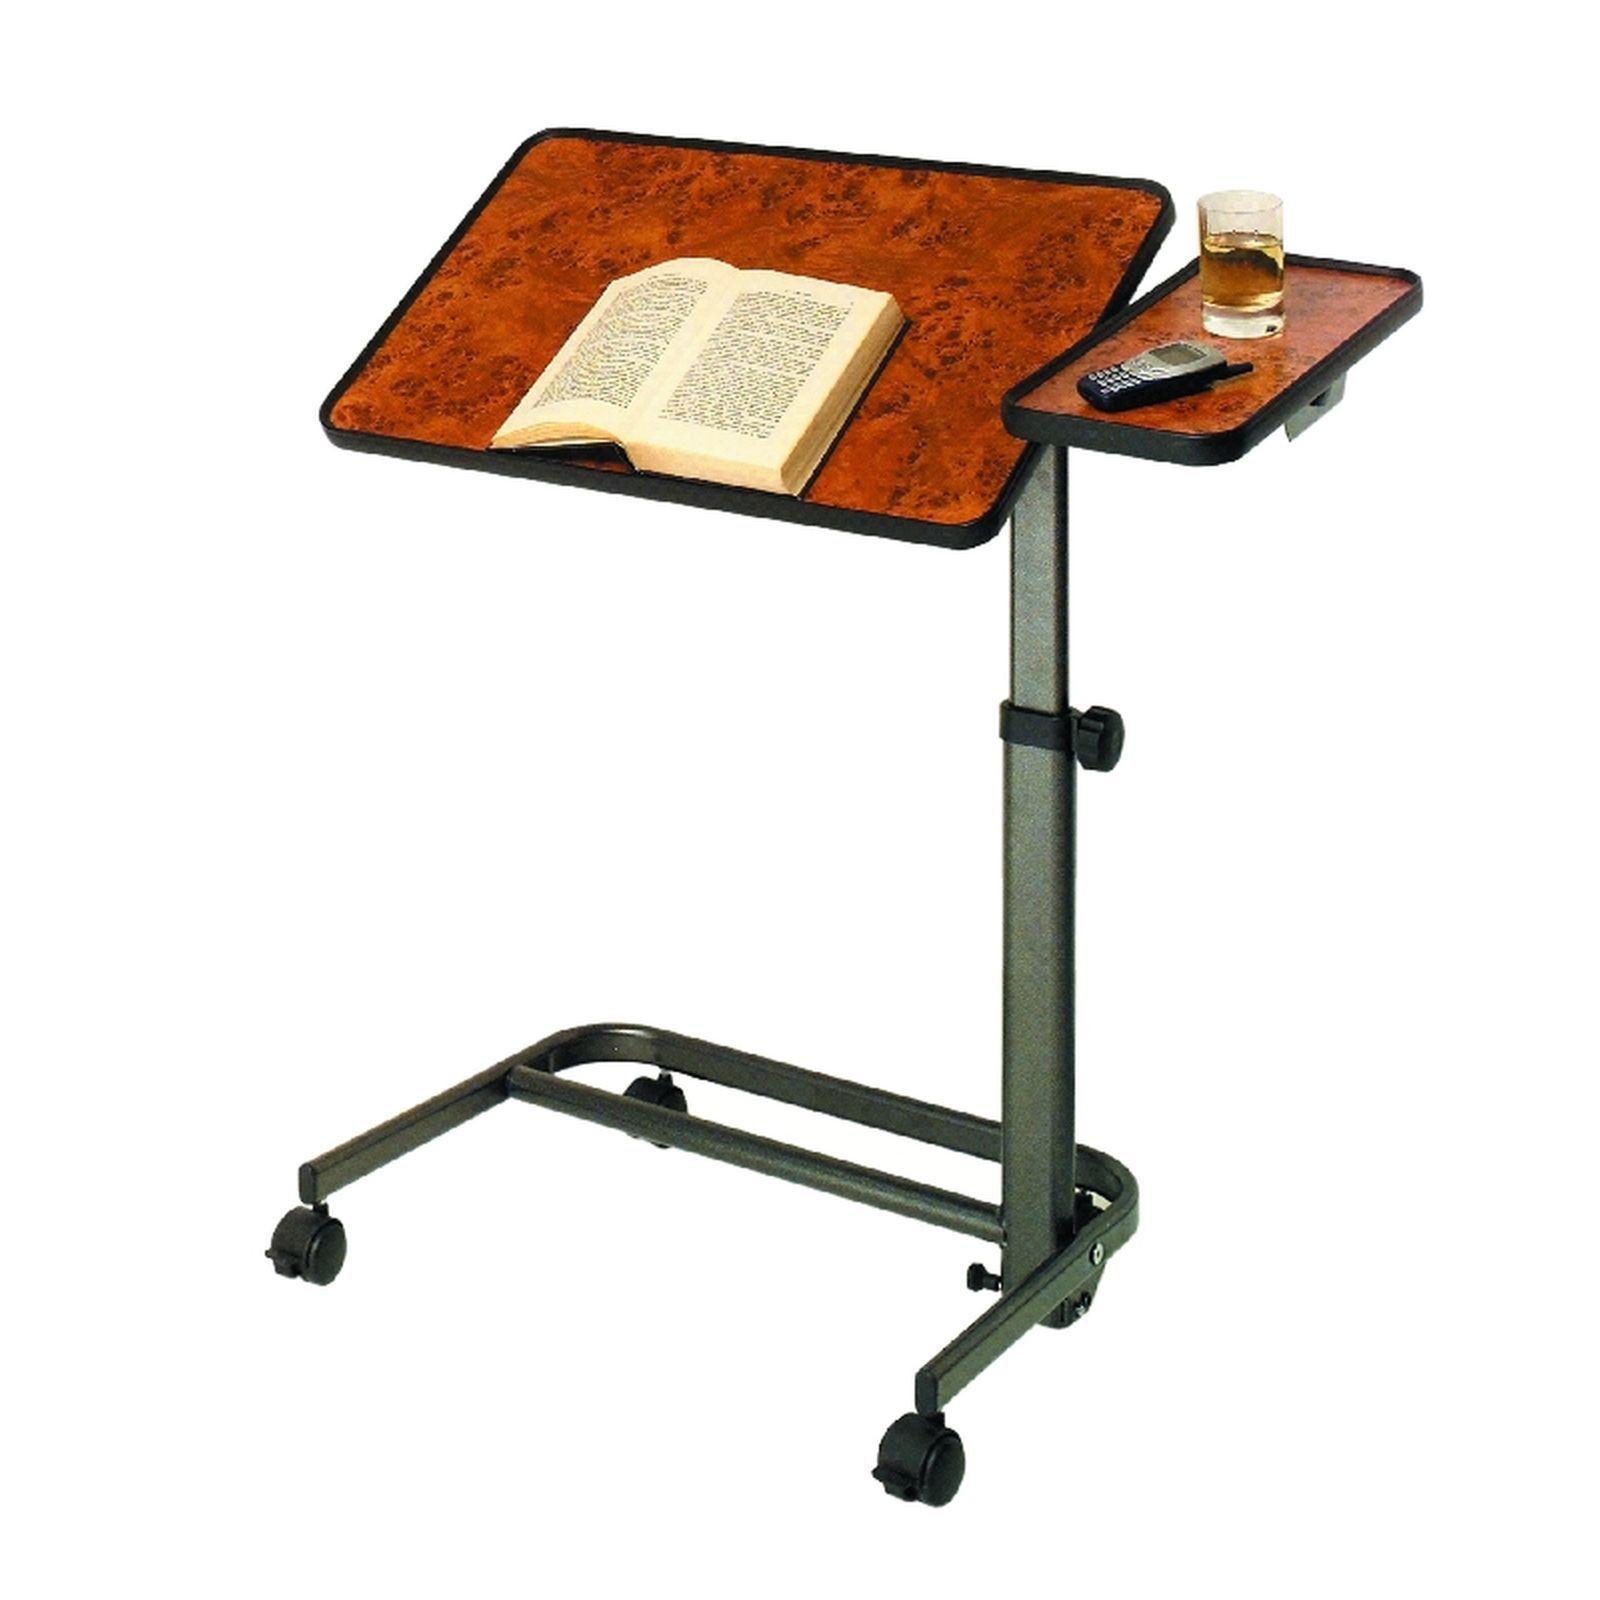 Diffusion ágyasztal 60x40cm-es asztallappal